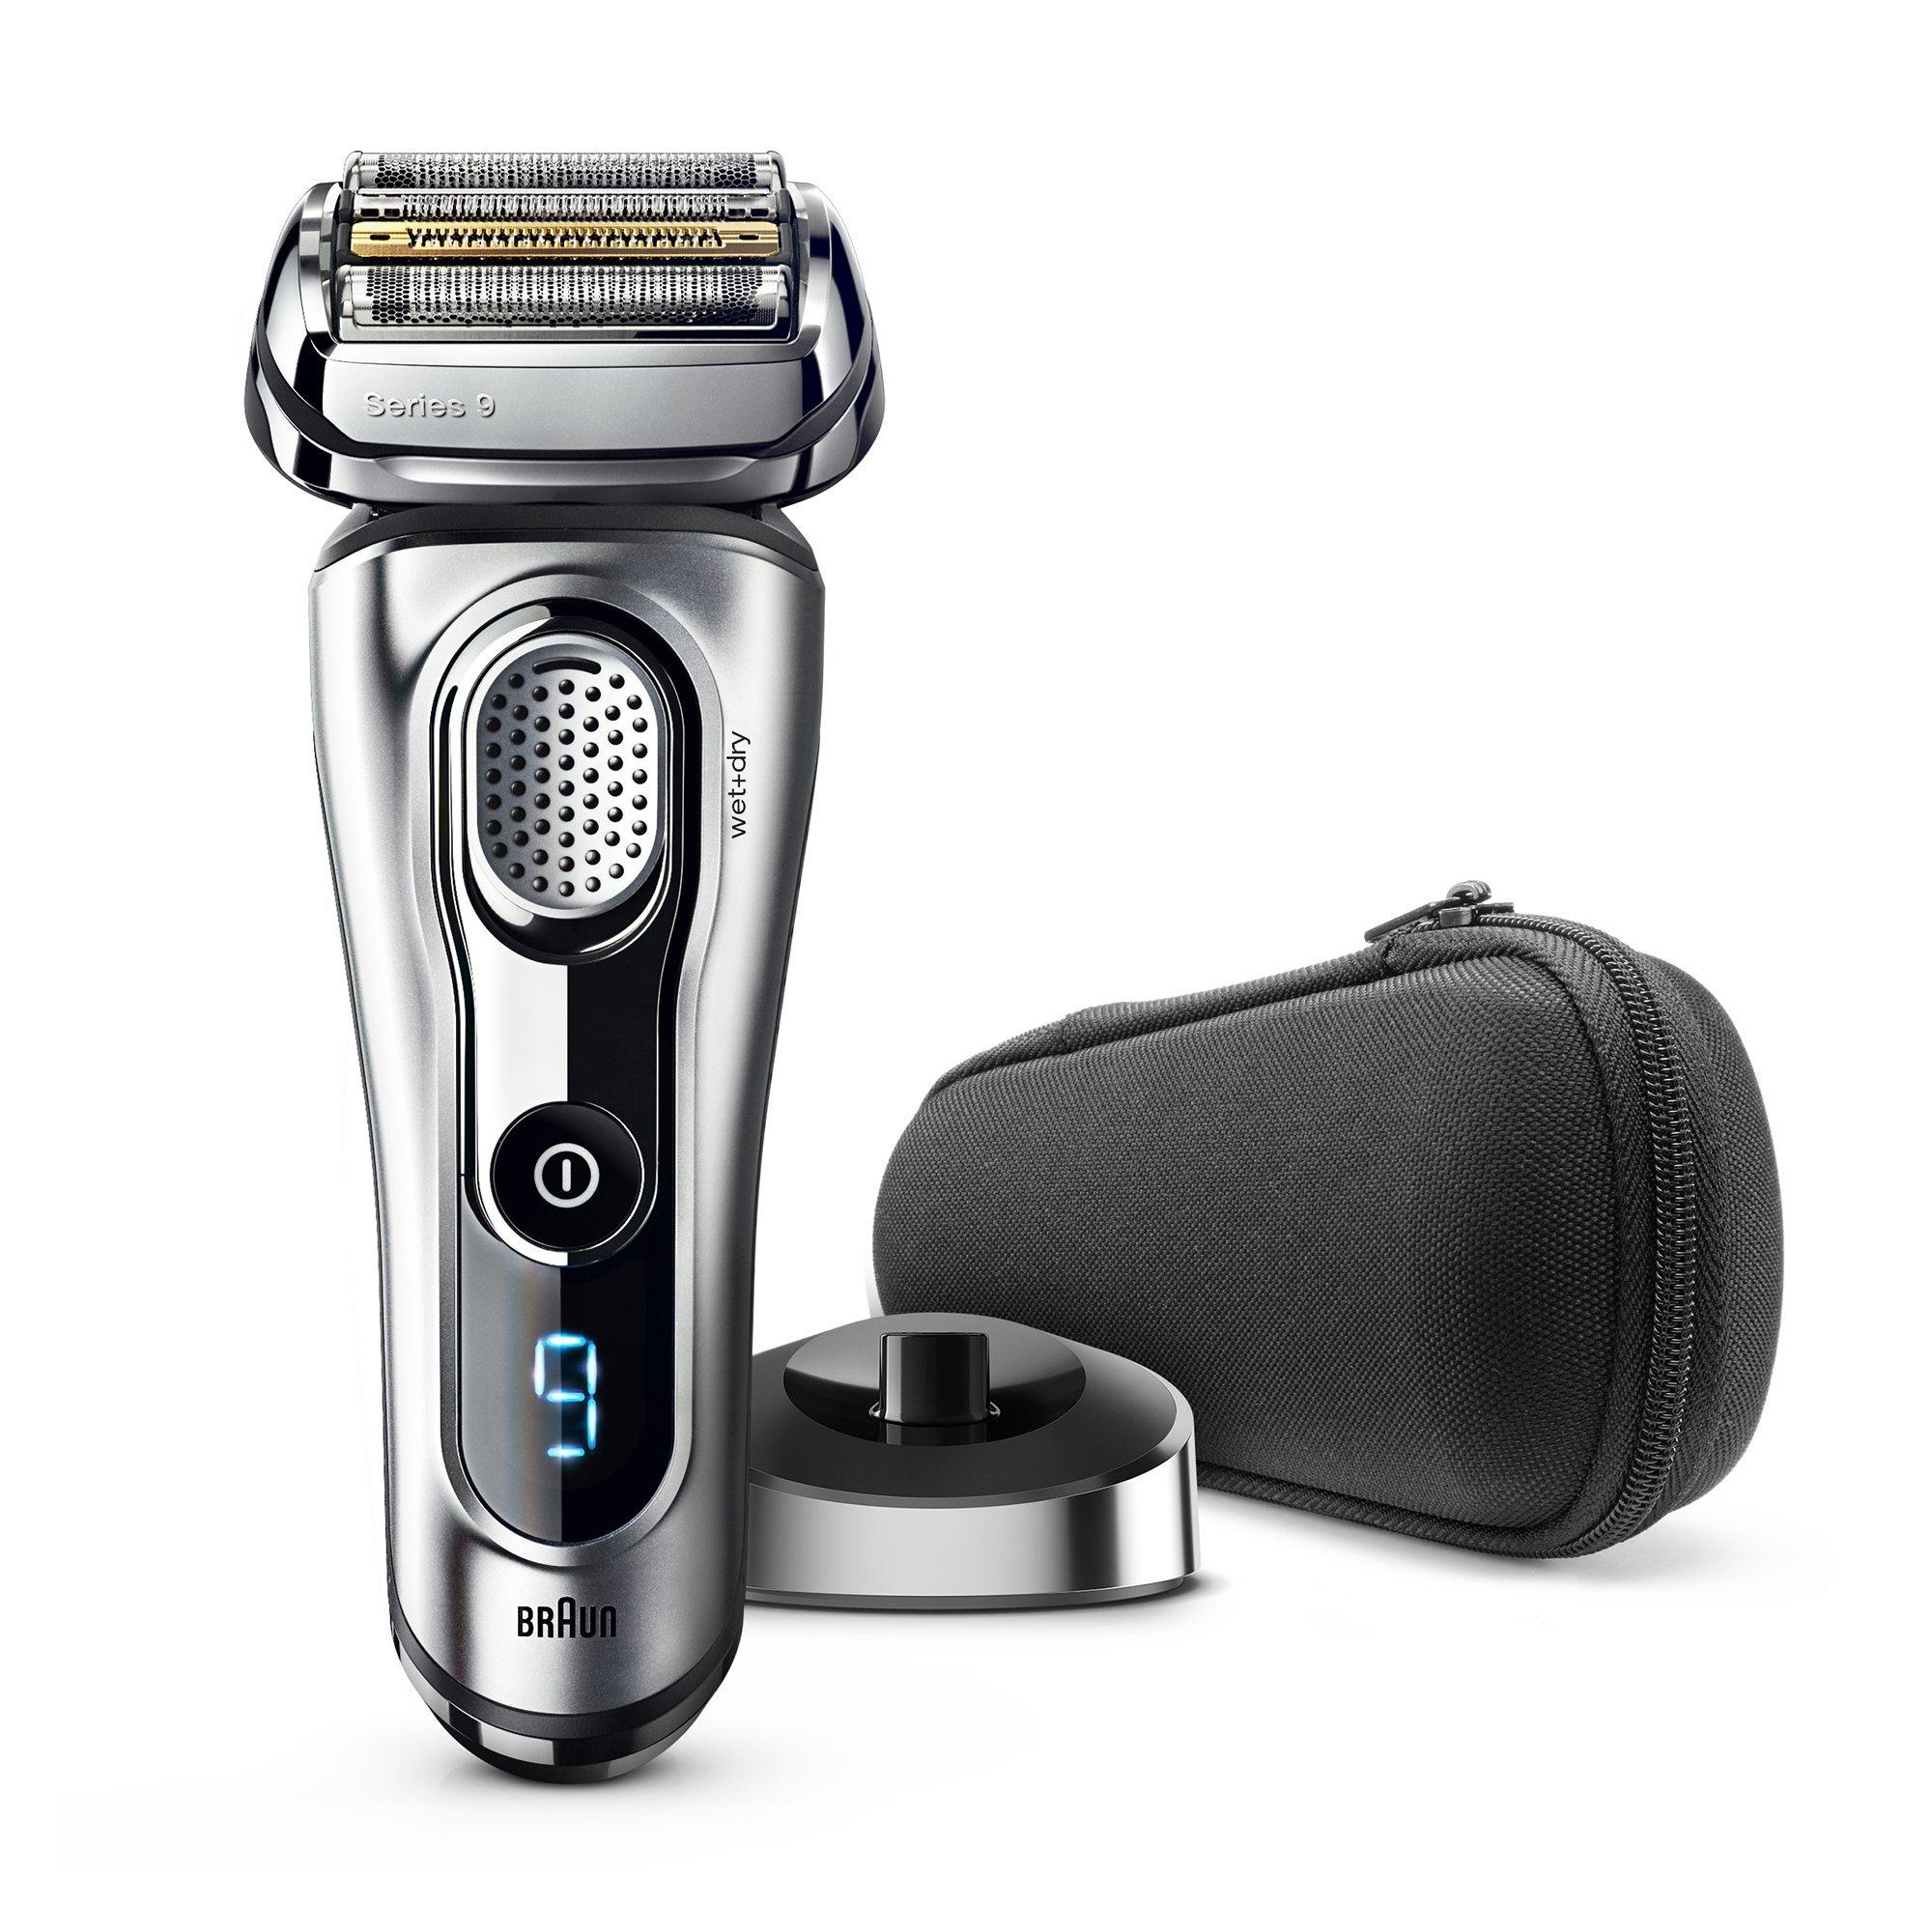 Braun 9260s Series 9 Shaving Head Special Pack, Folienrasierer, Nass-/Trockenrasur